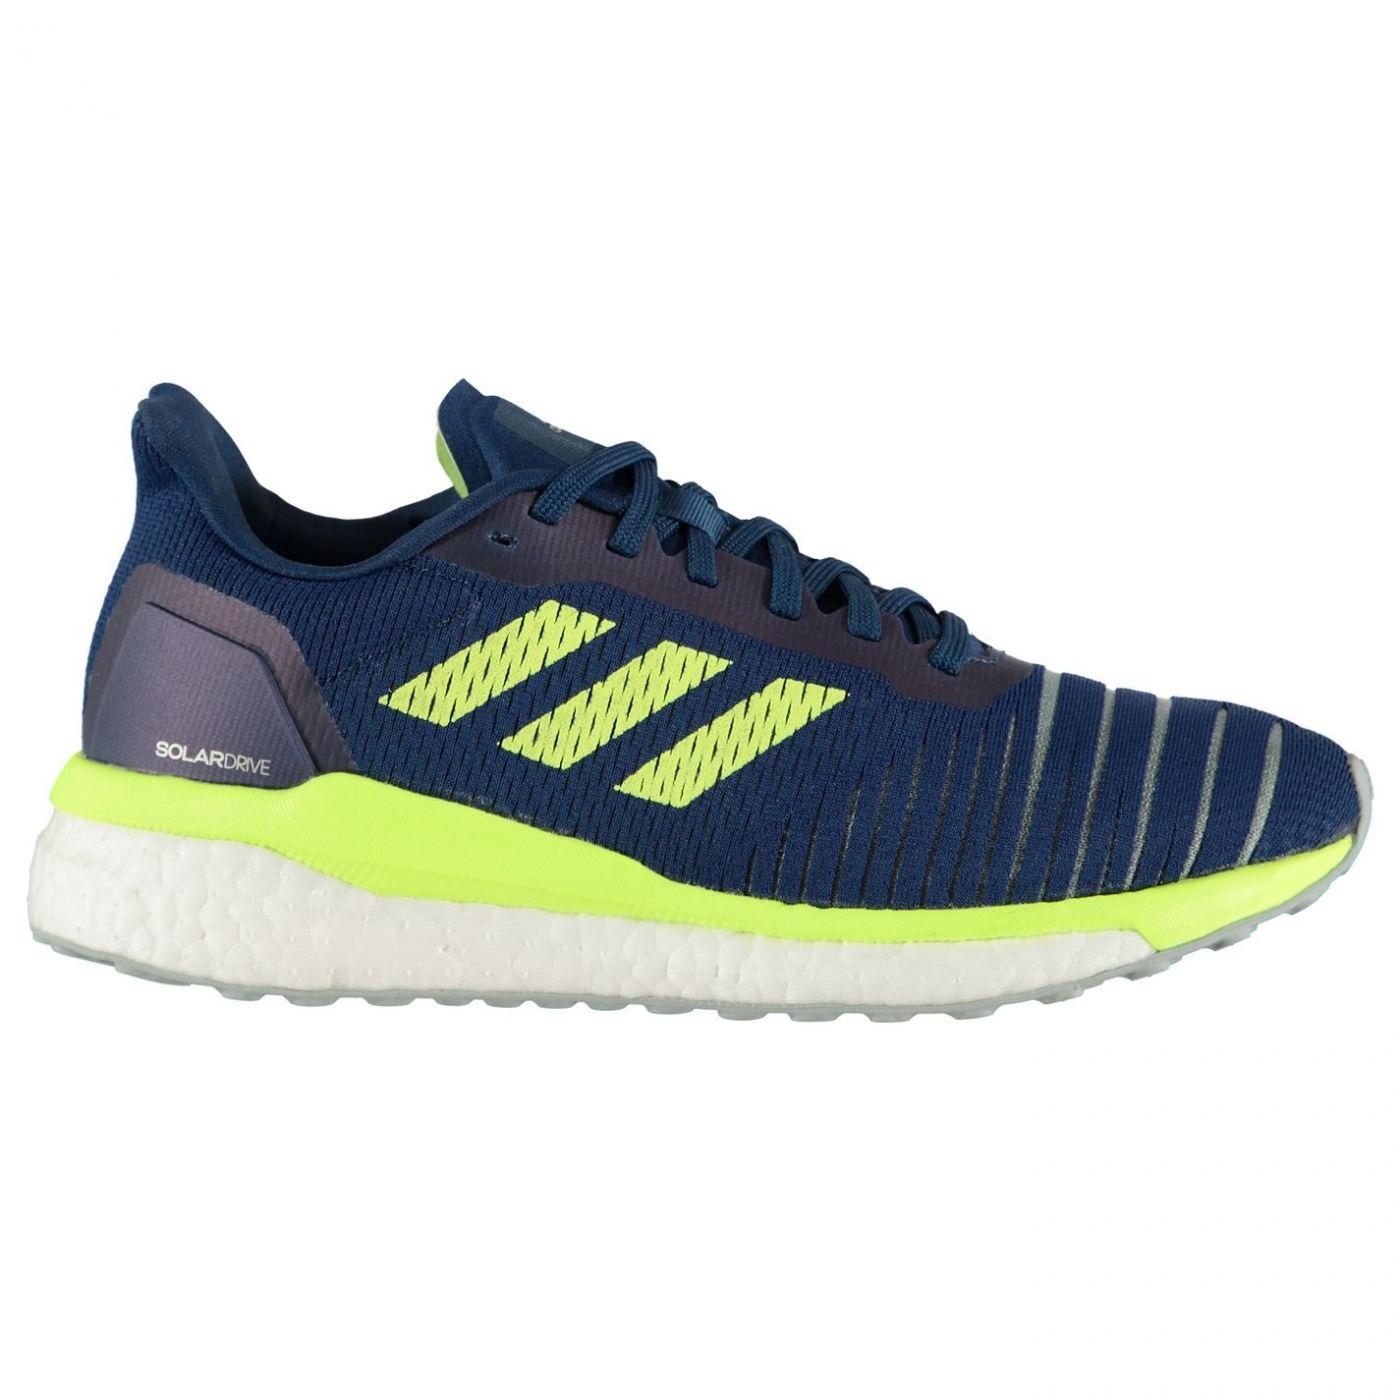 Adidas Solar Drive Ladies' Running Shoes